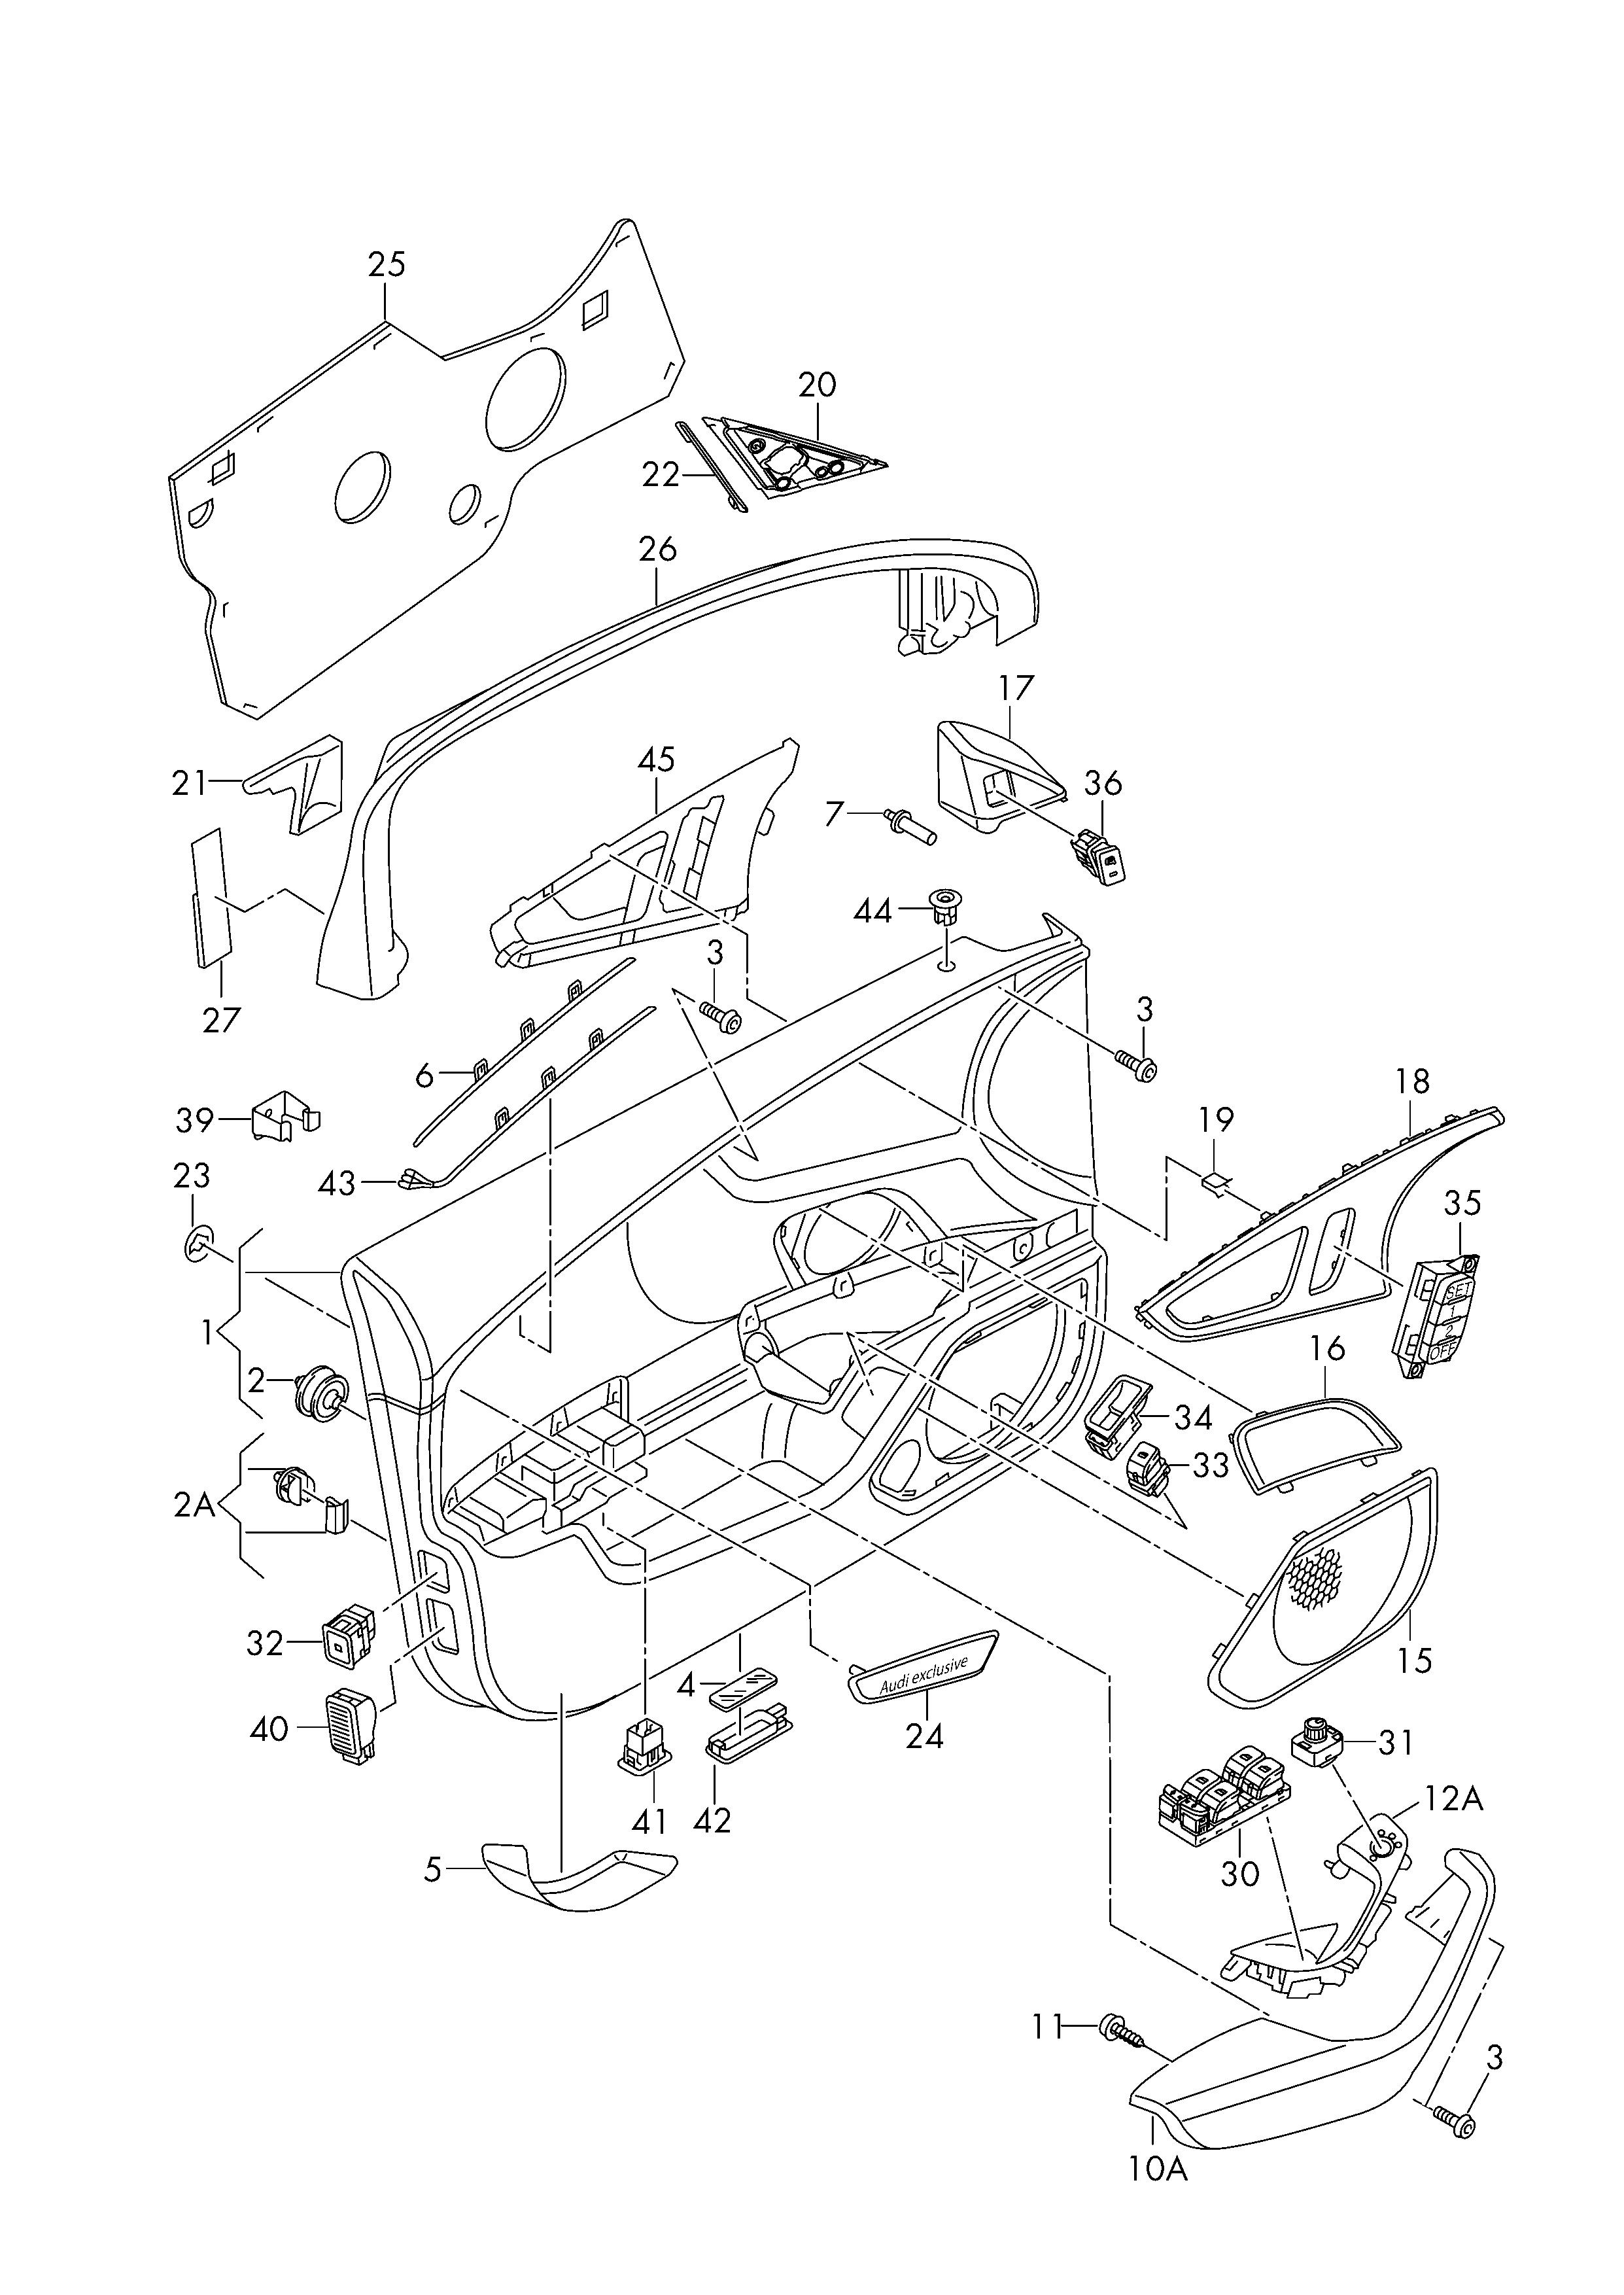 medium resolution of audi a6 parts diagram wiring diagram advance audi a6 c5 parts diagram